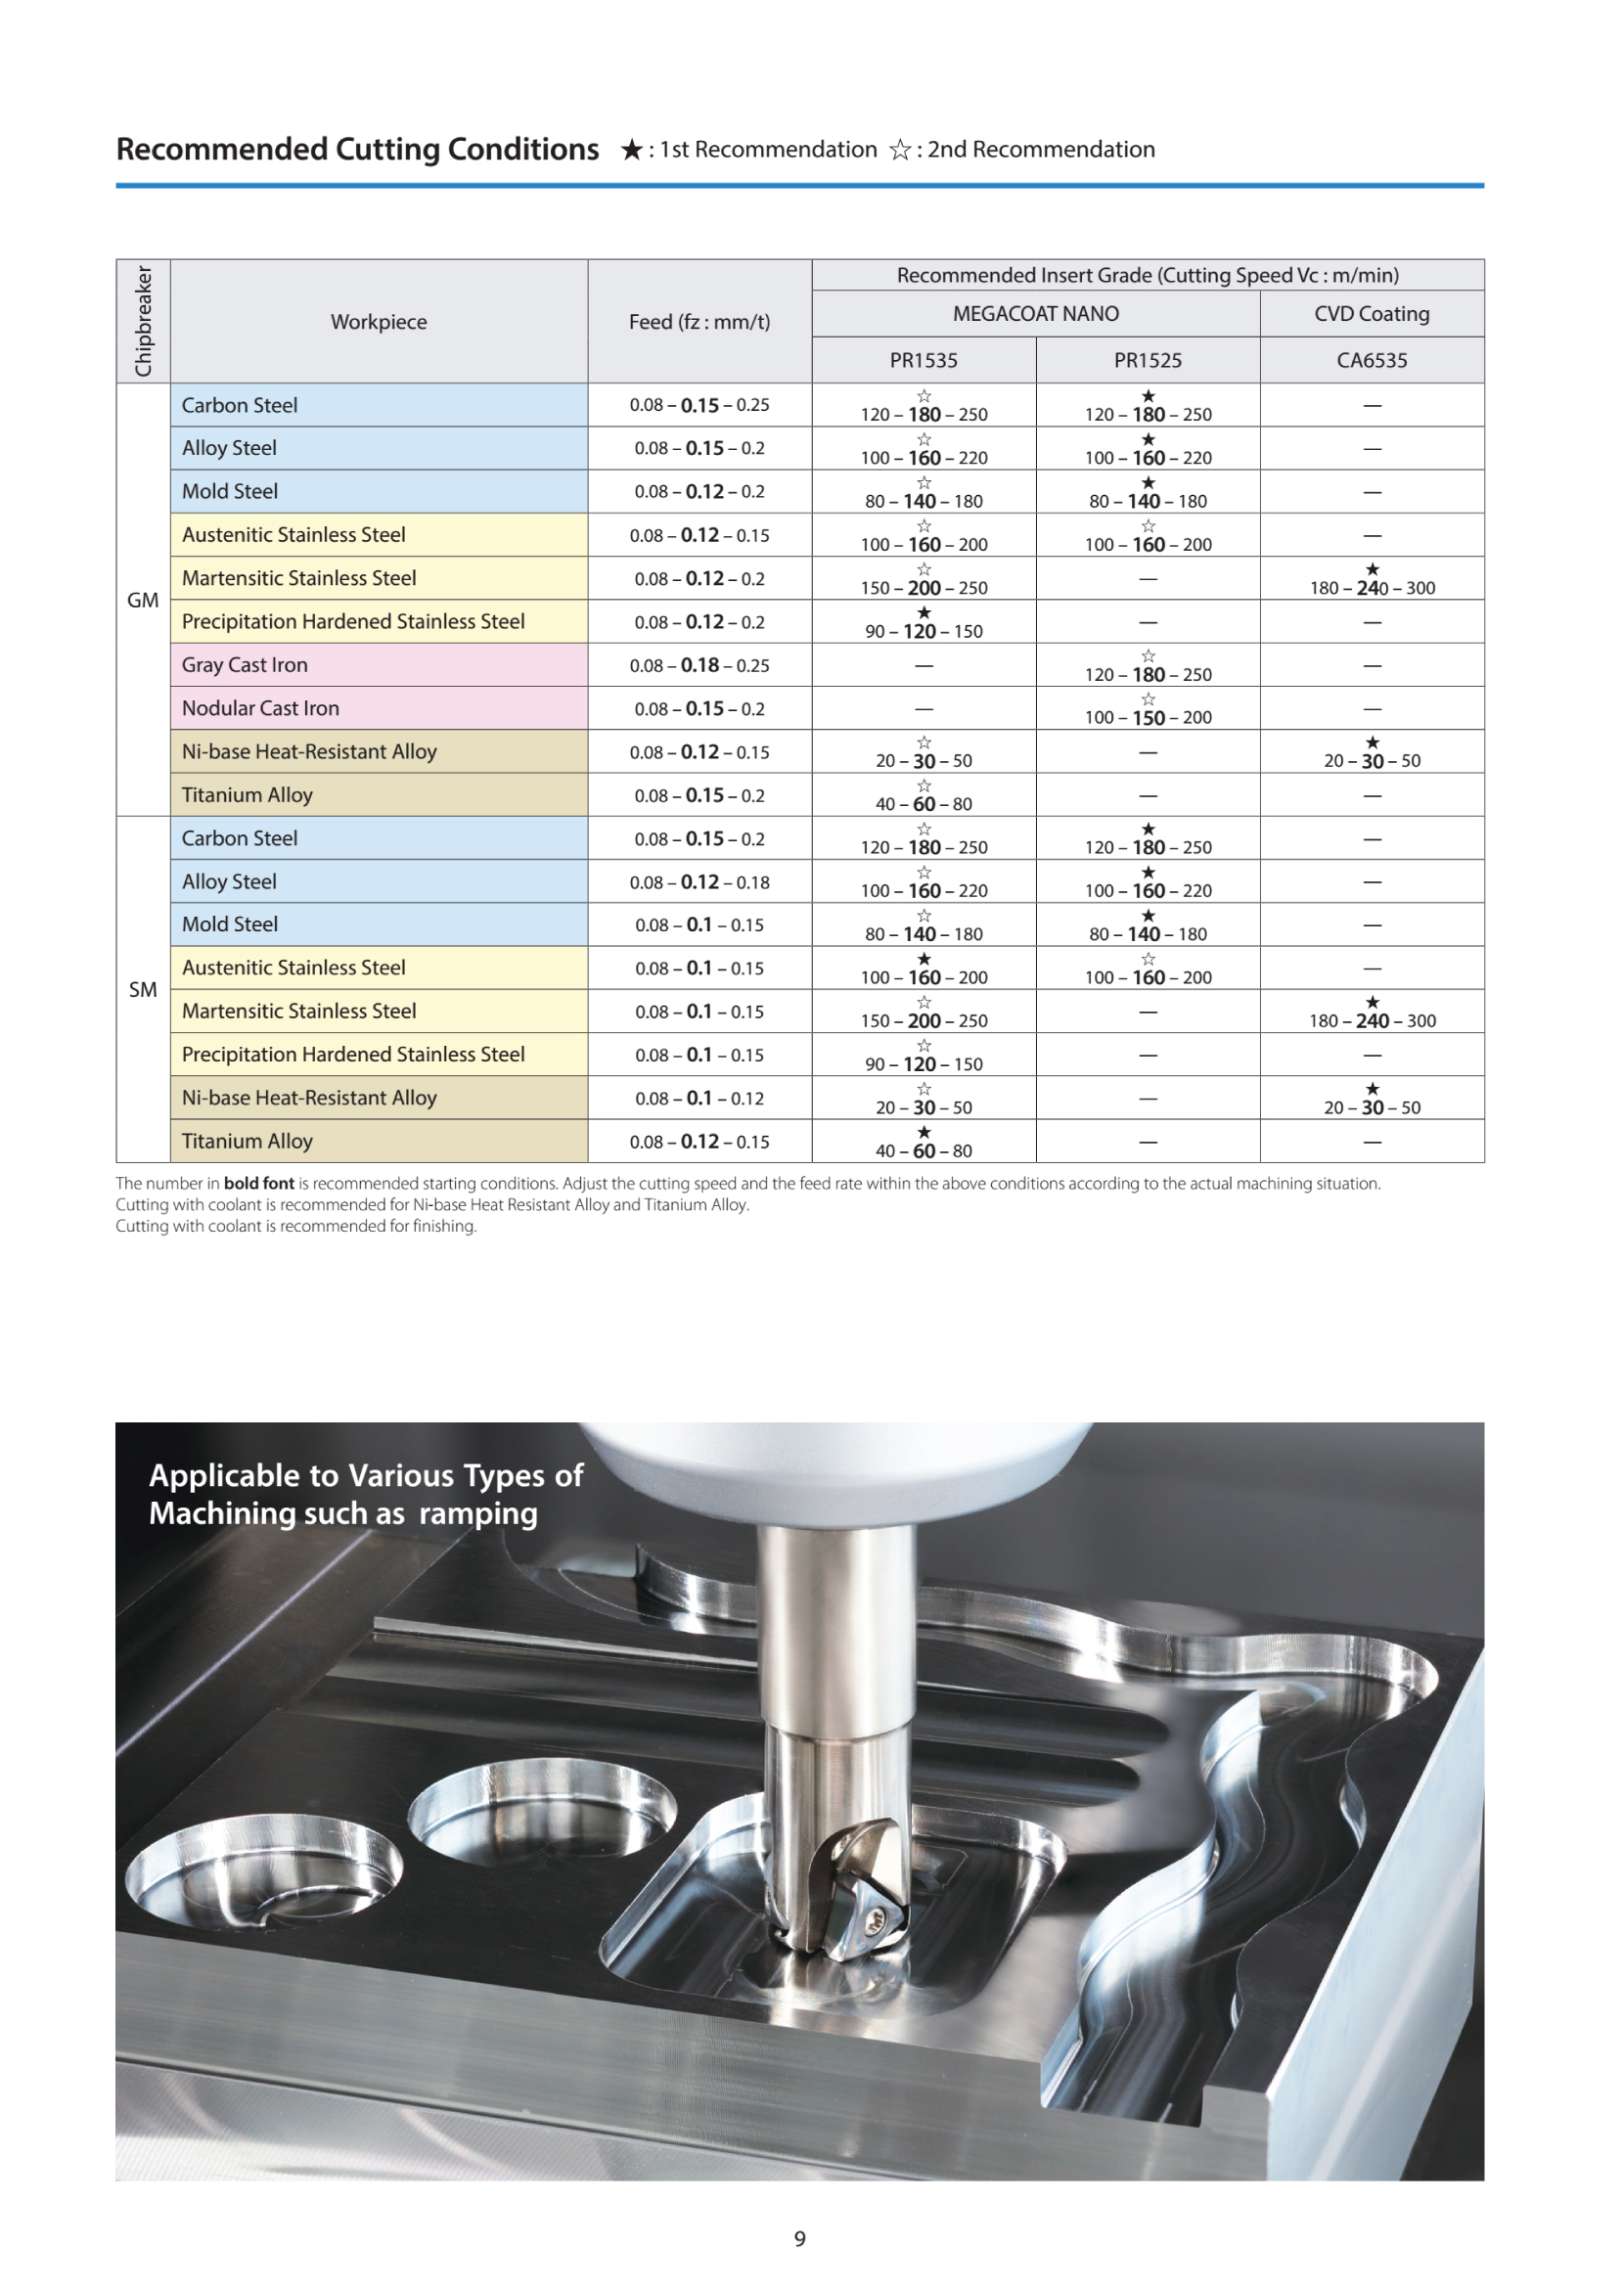 Dao phay gắn mảnh Kyocera MEV hiệu suất cao 10